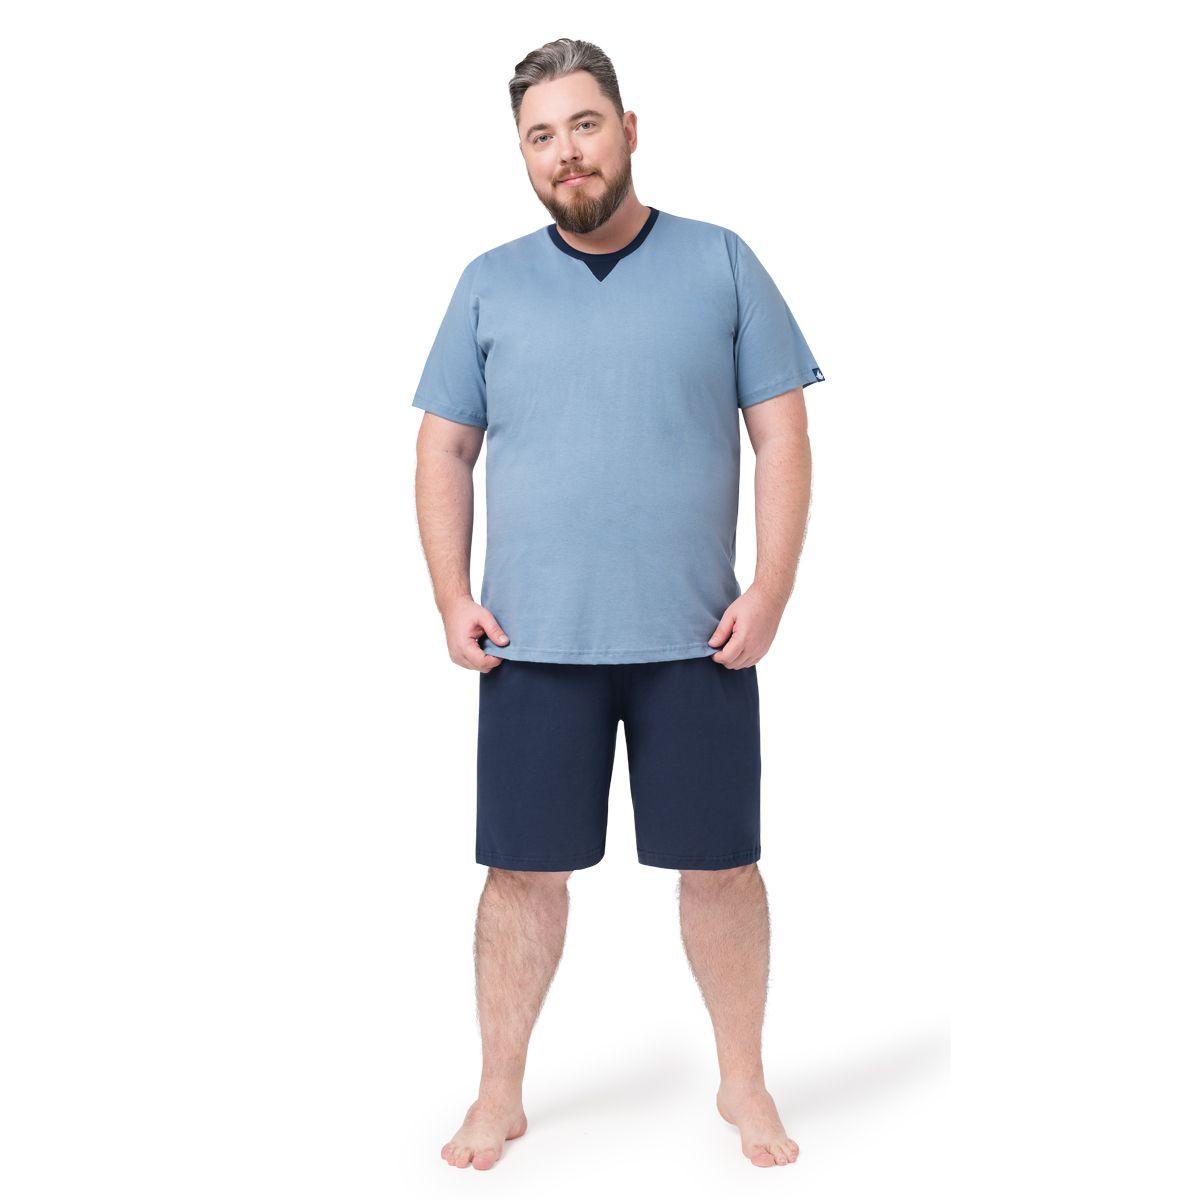 Pijama Masculino Curto Algodão 05.02.003